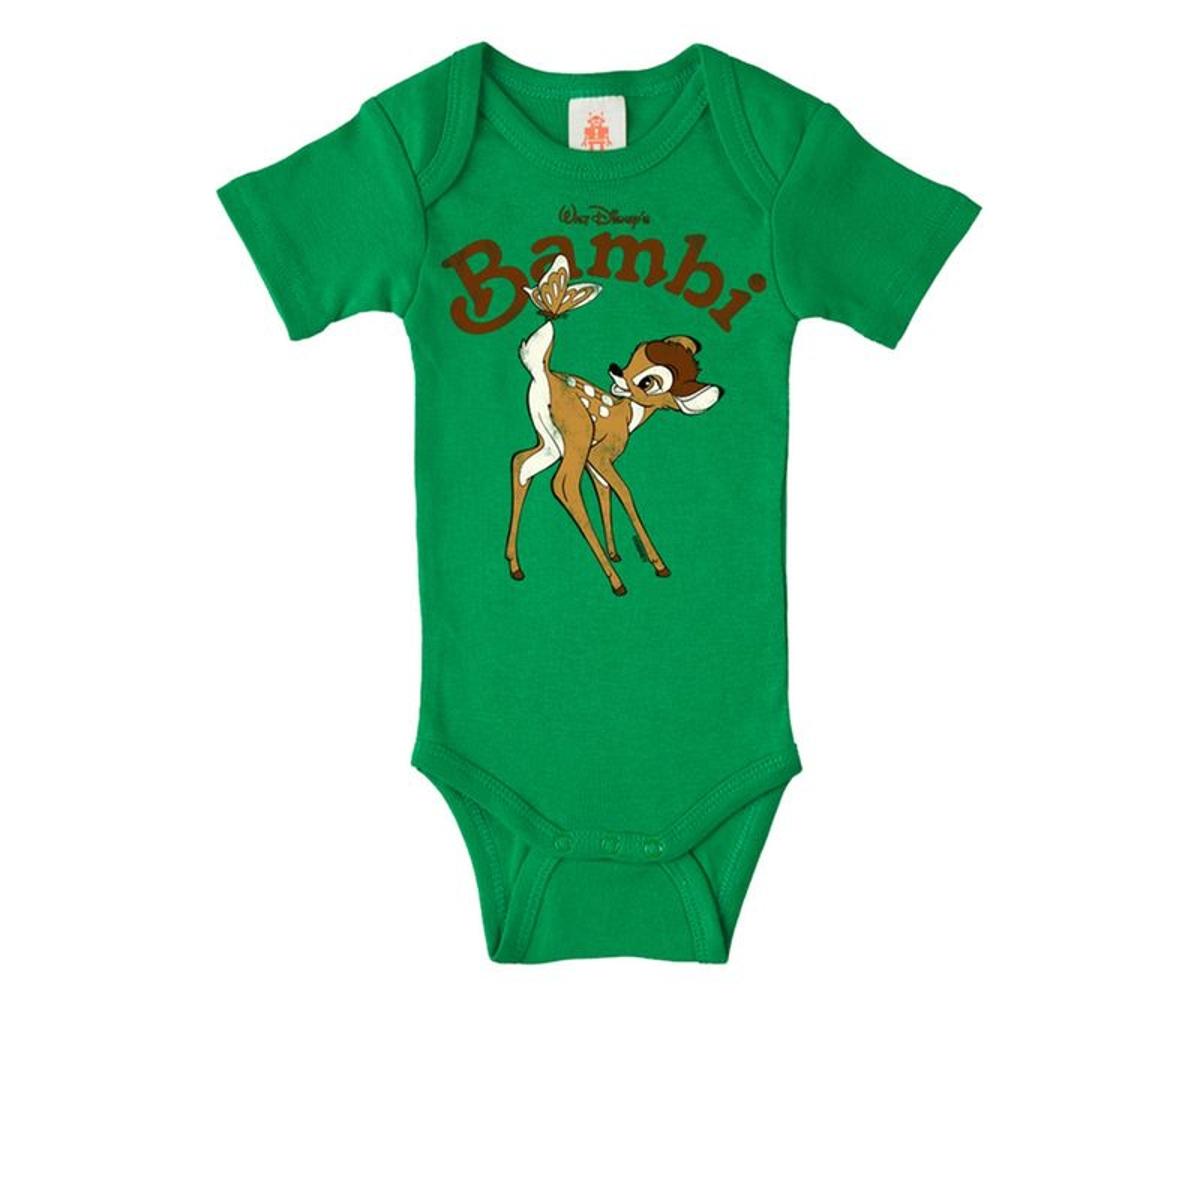 Body bébé Bambi - Disney - Body bébé de Logoshirt -  vert